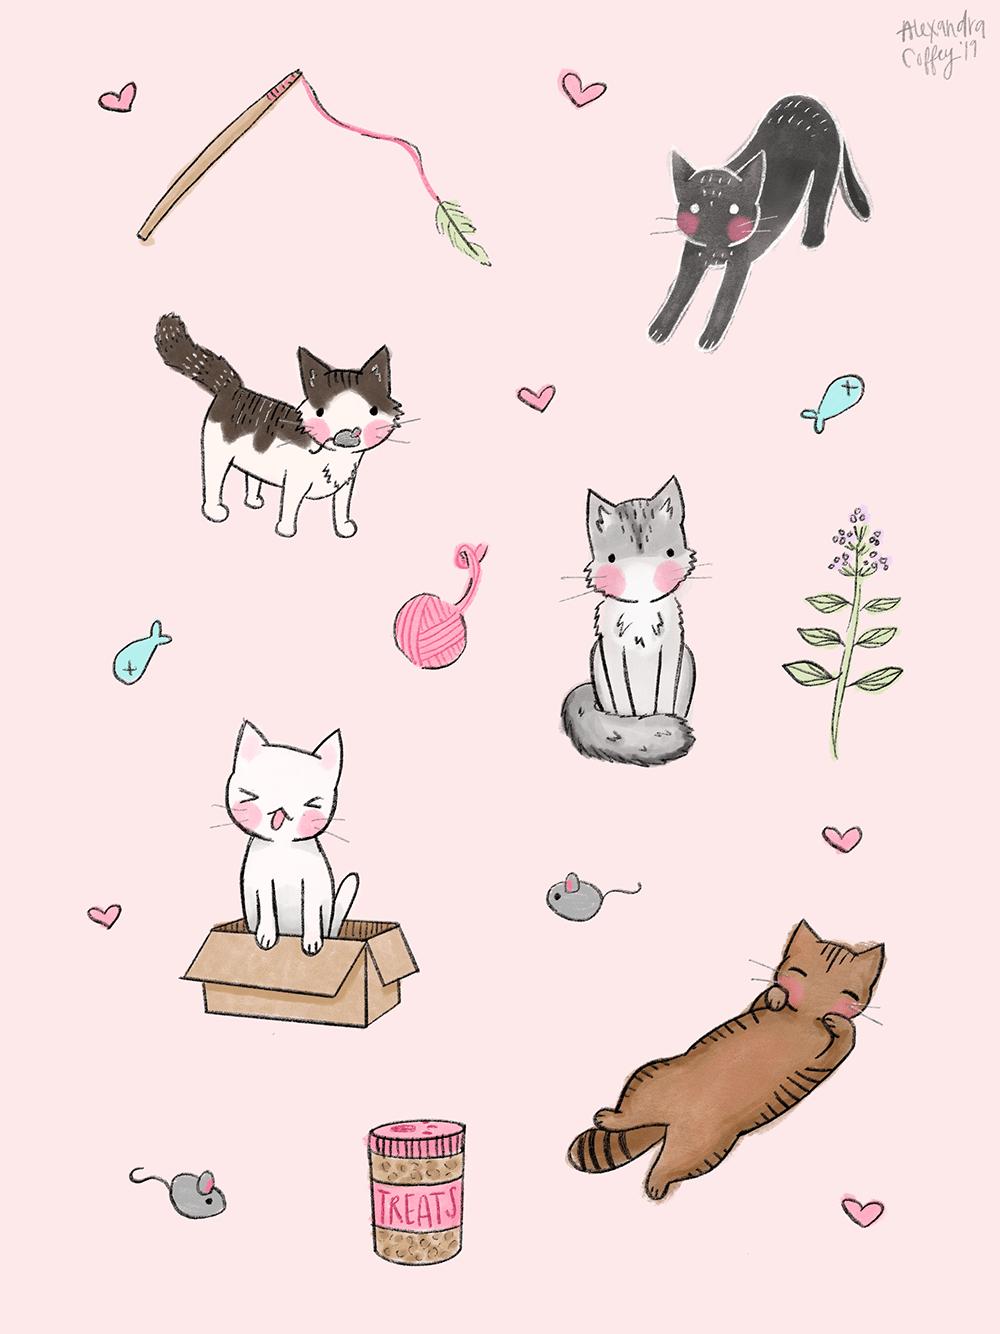 Cat Doodles - image 1 - student project